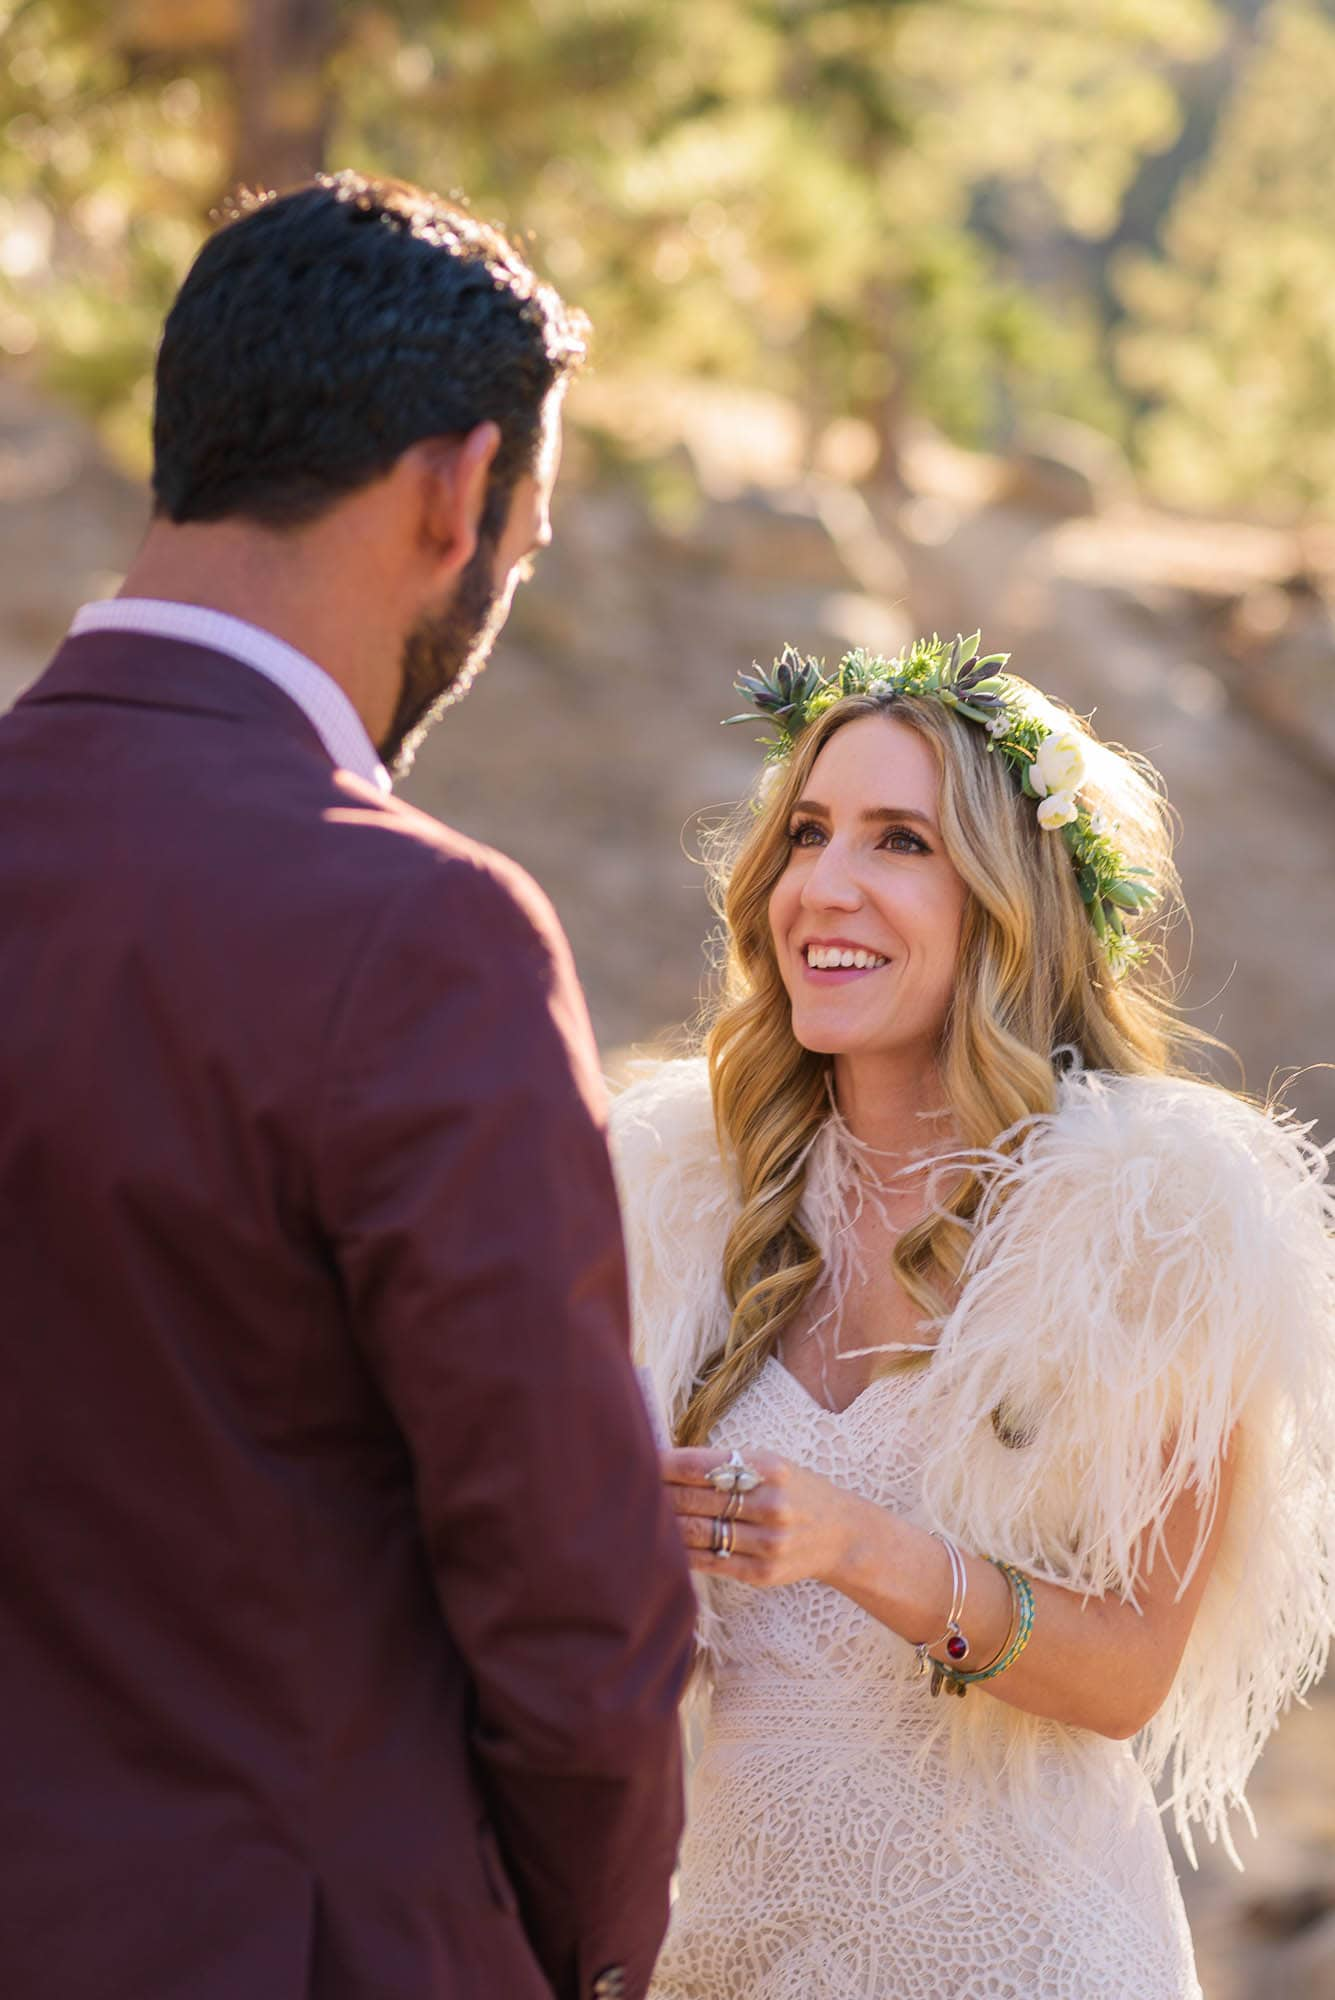 021_Alan_and_Heidi_Wedding_Natalie_Mike